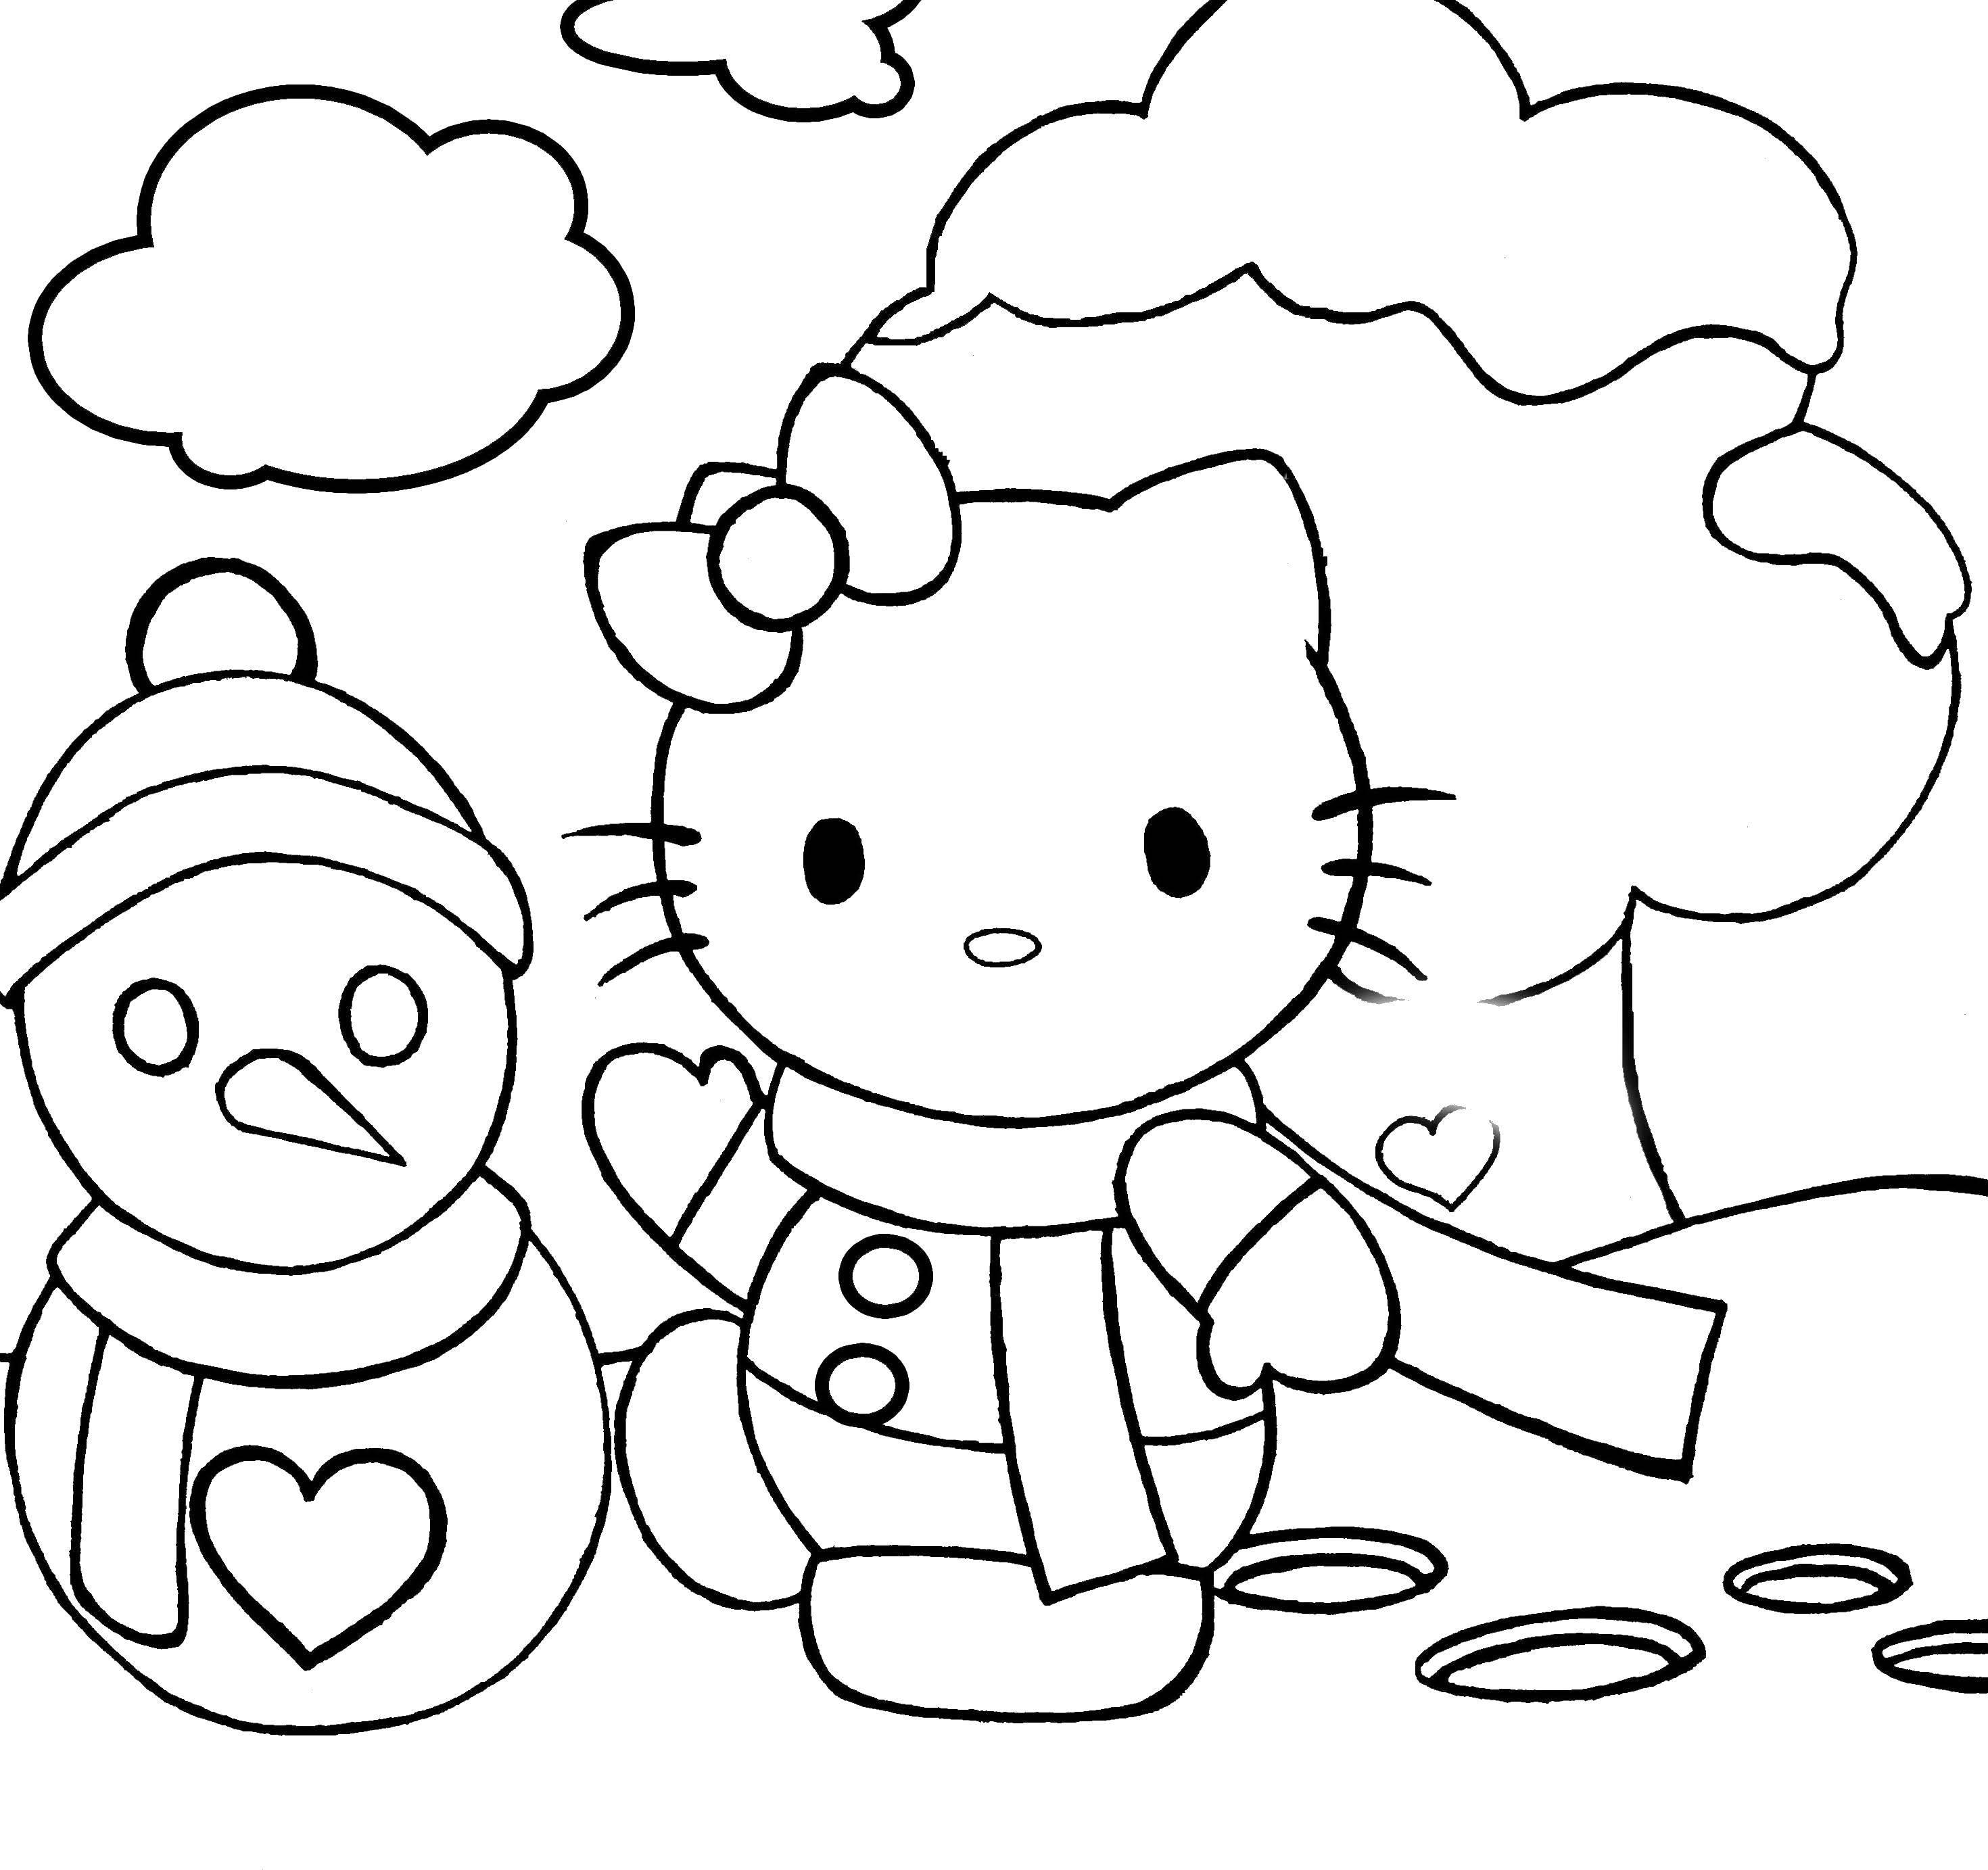 Раскраска Хэллоу китти и снеговик. Скачать хэллоу китти, снеговик, мультфильмы.  Распечатать ,Хэллоу Китти,